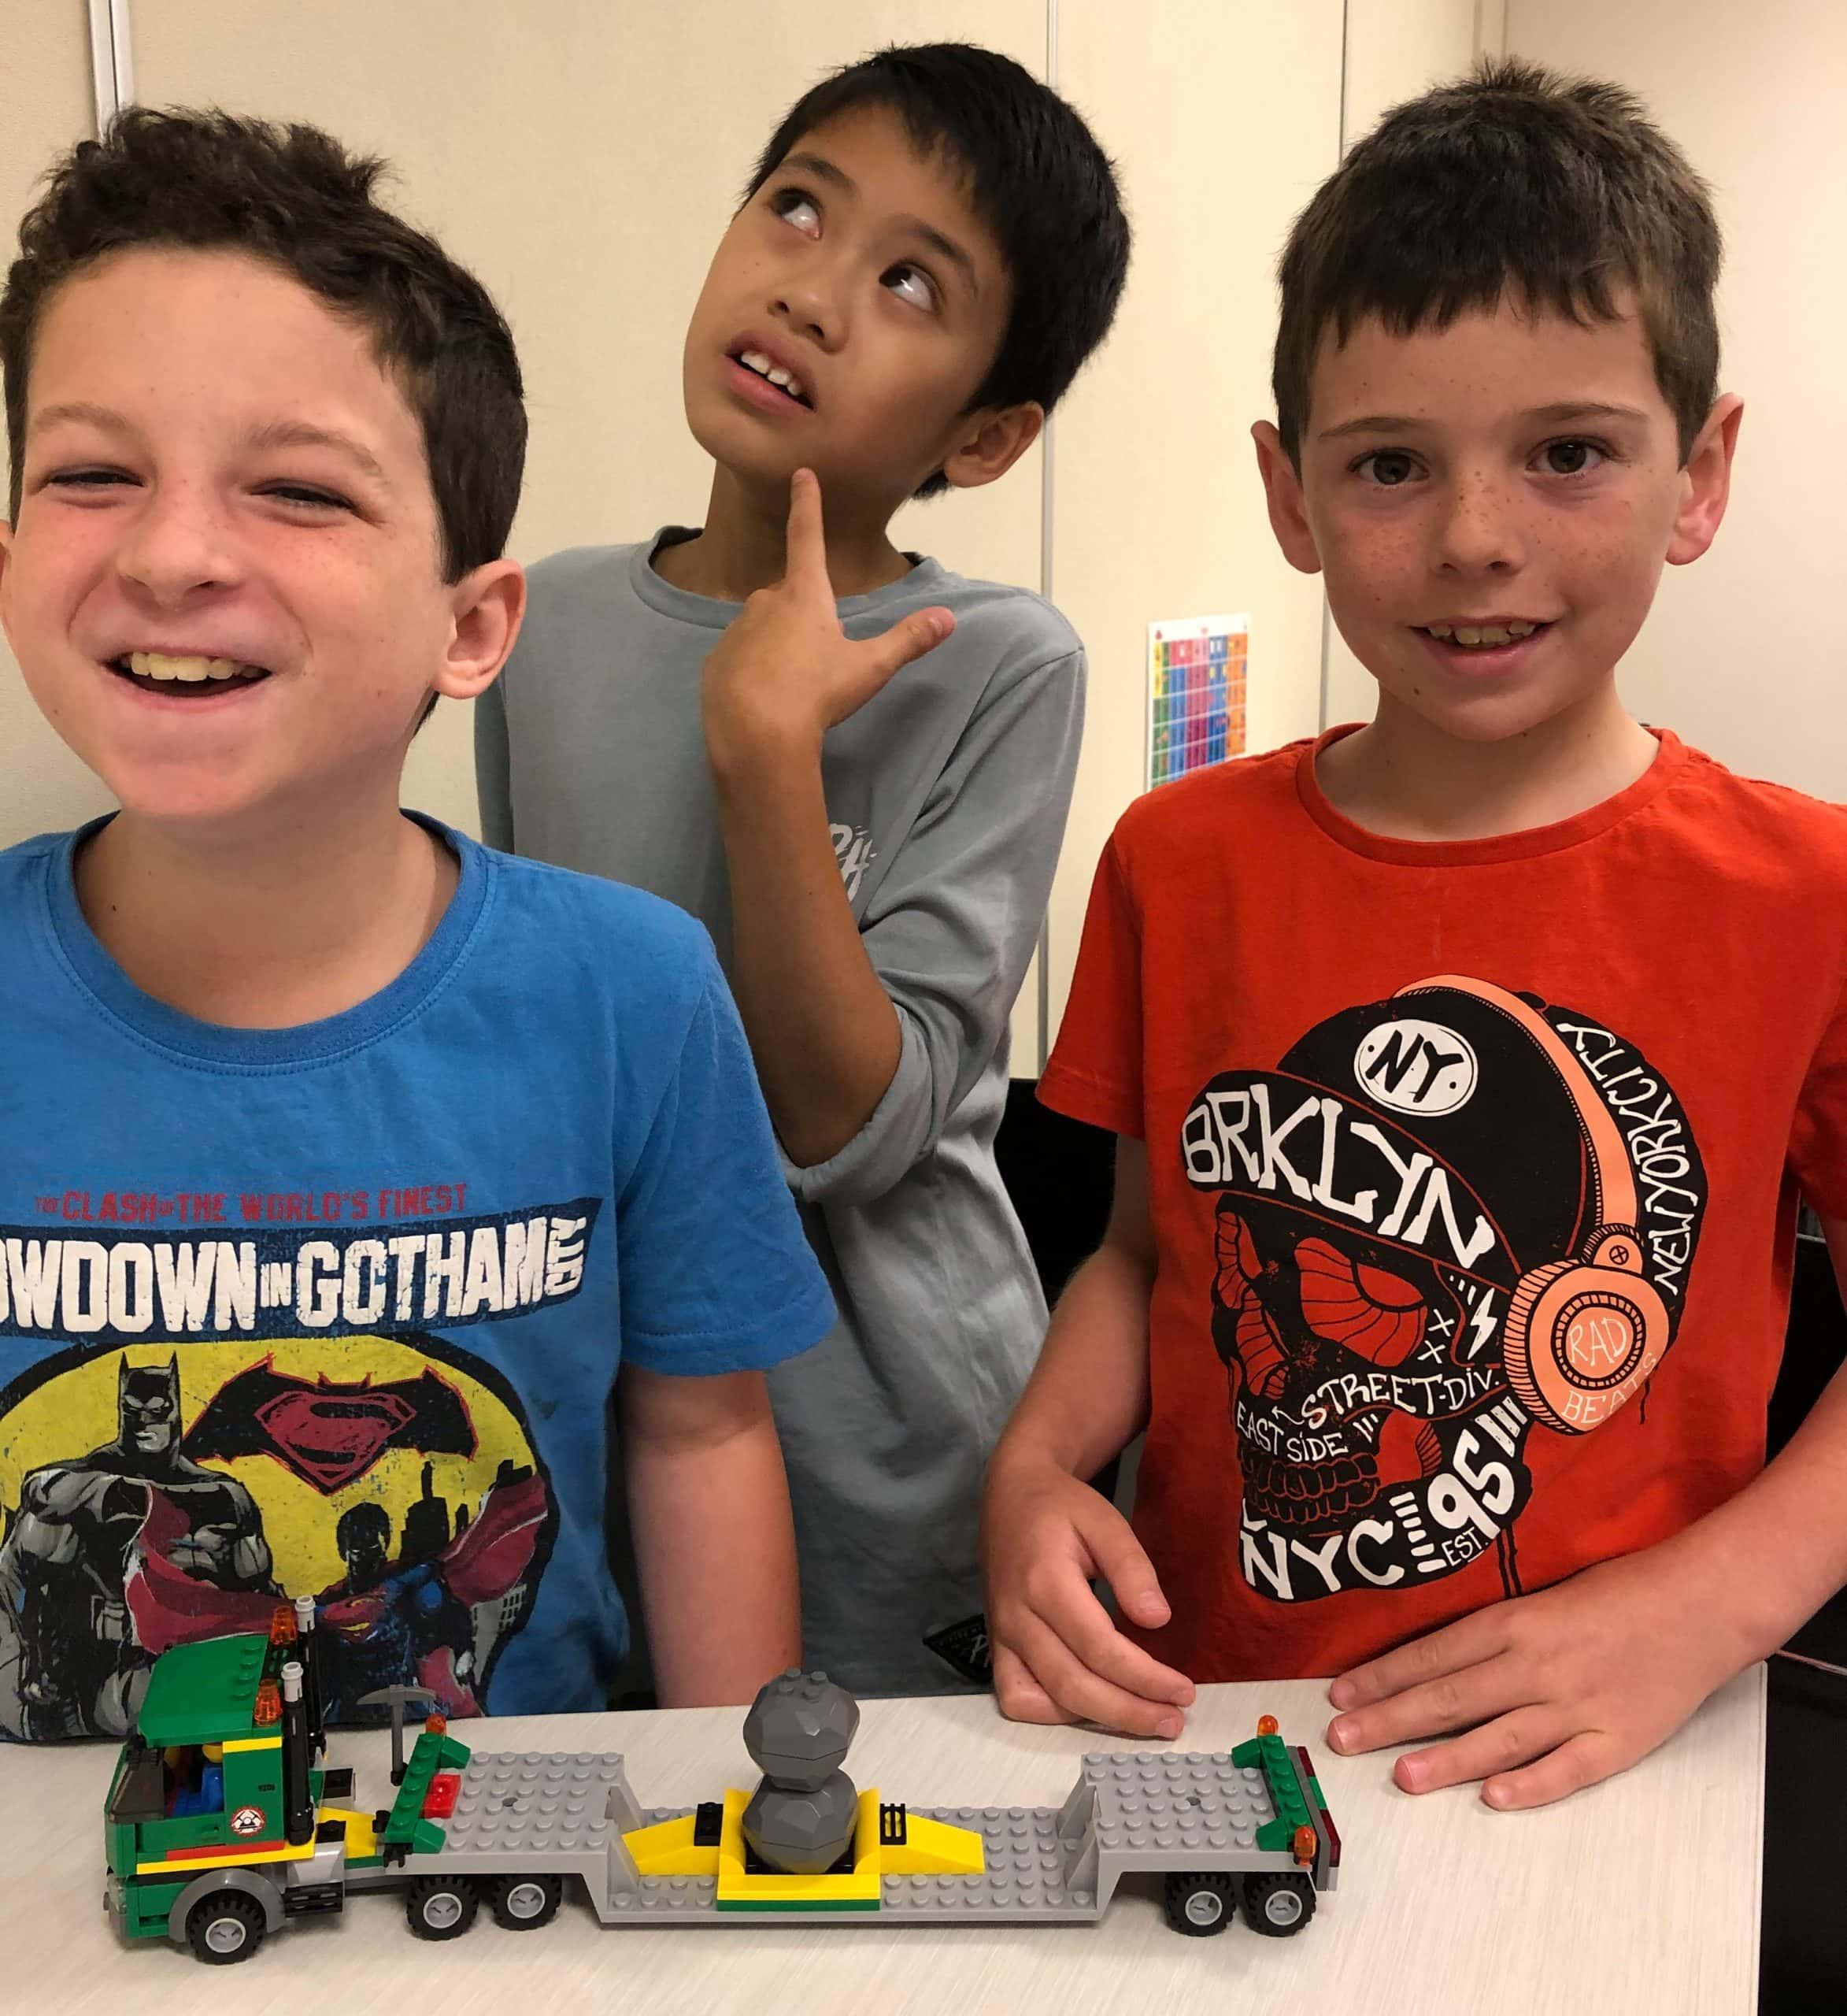 3 boys with their LEGO model